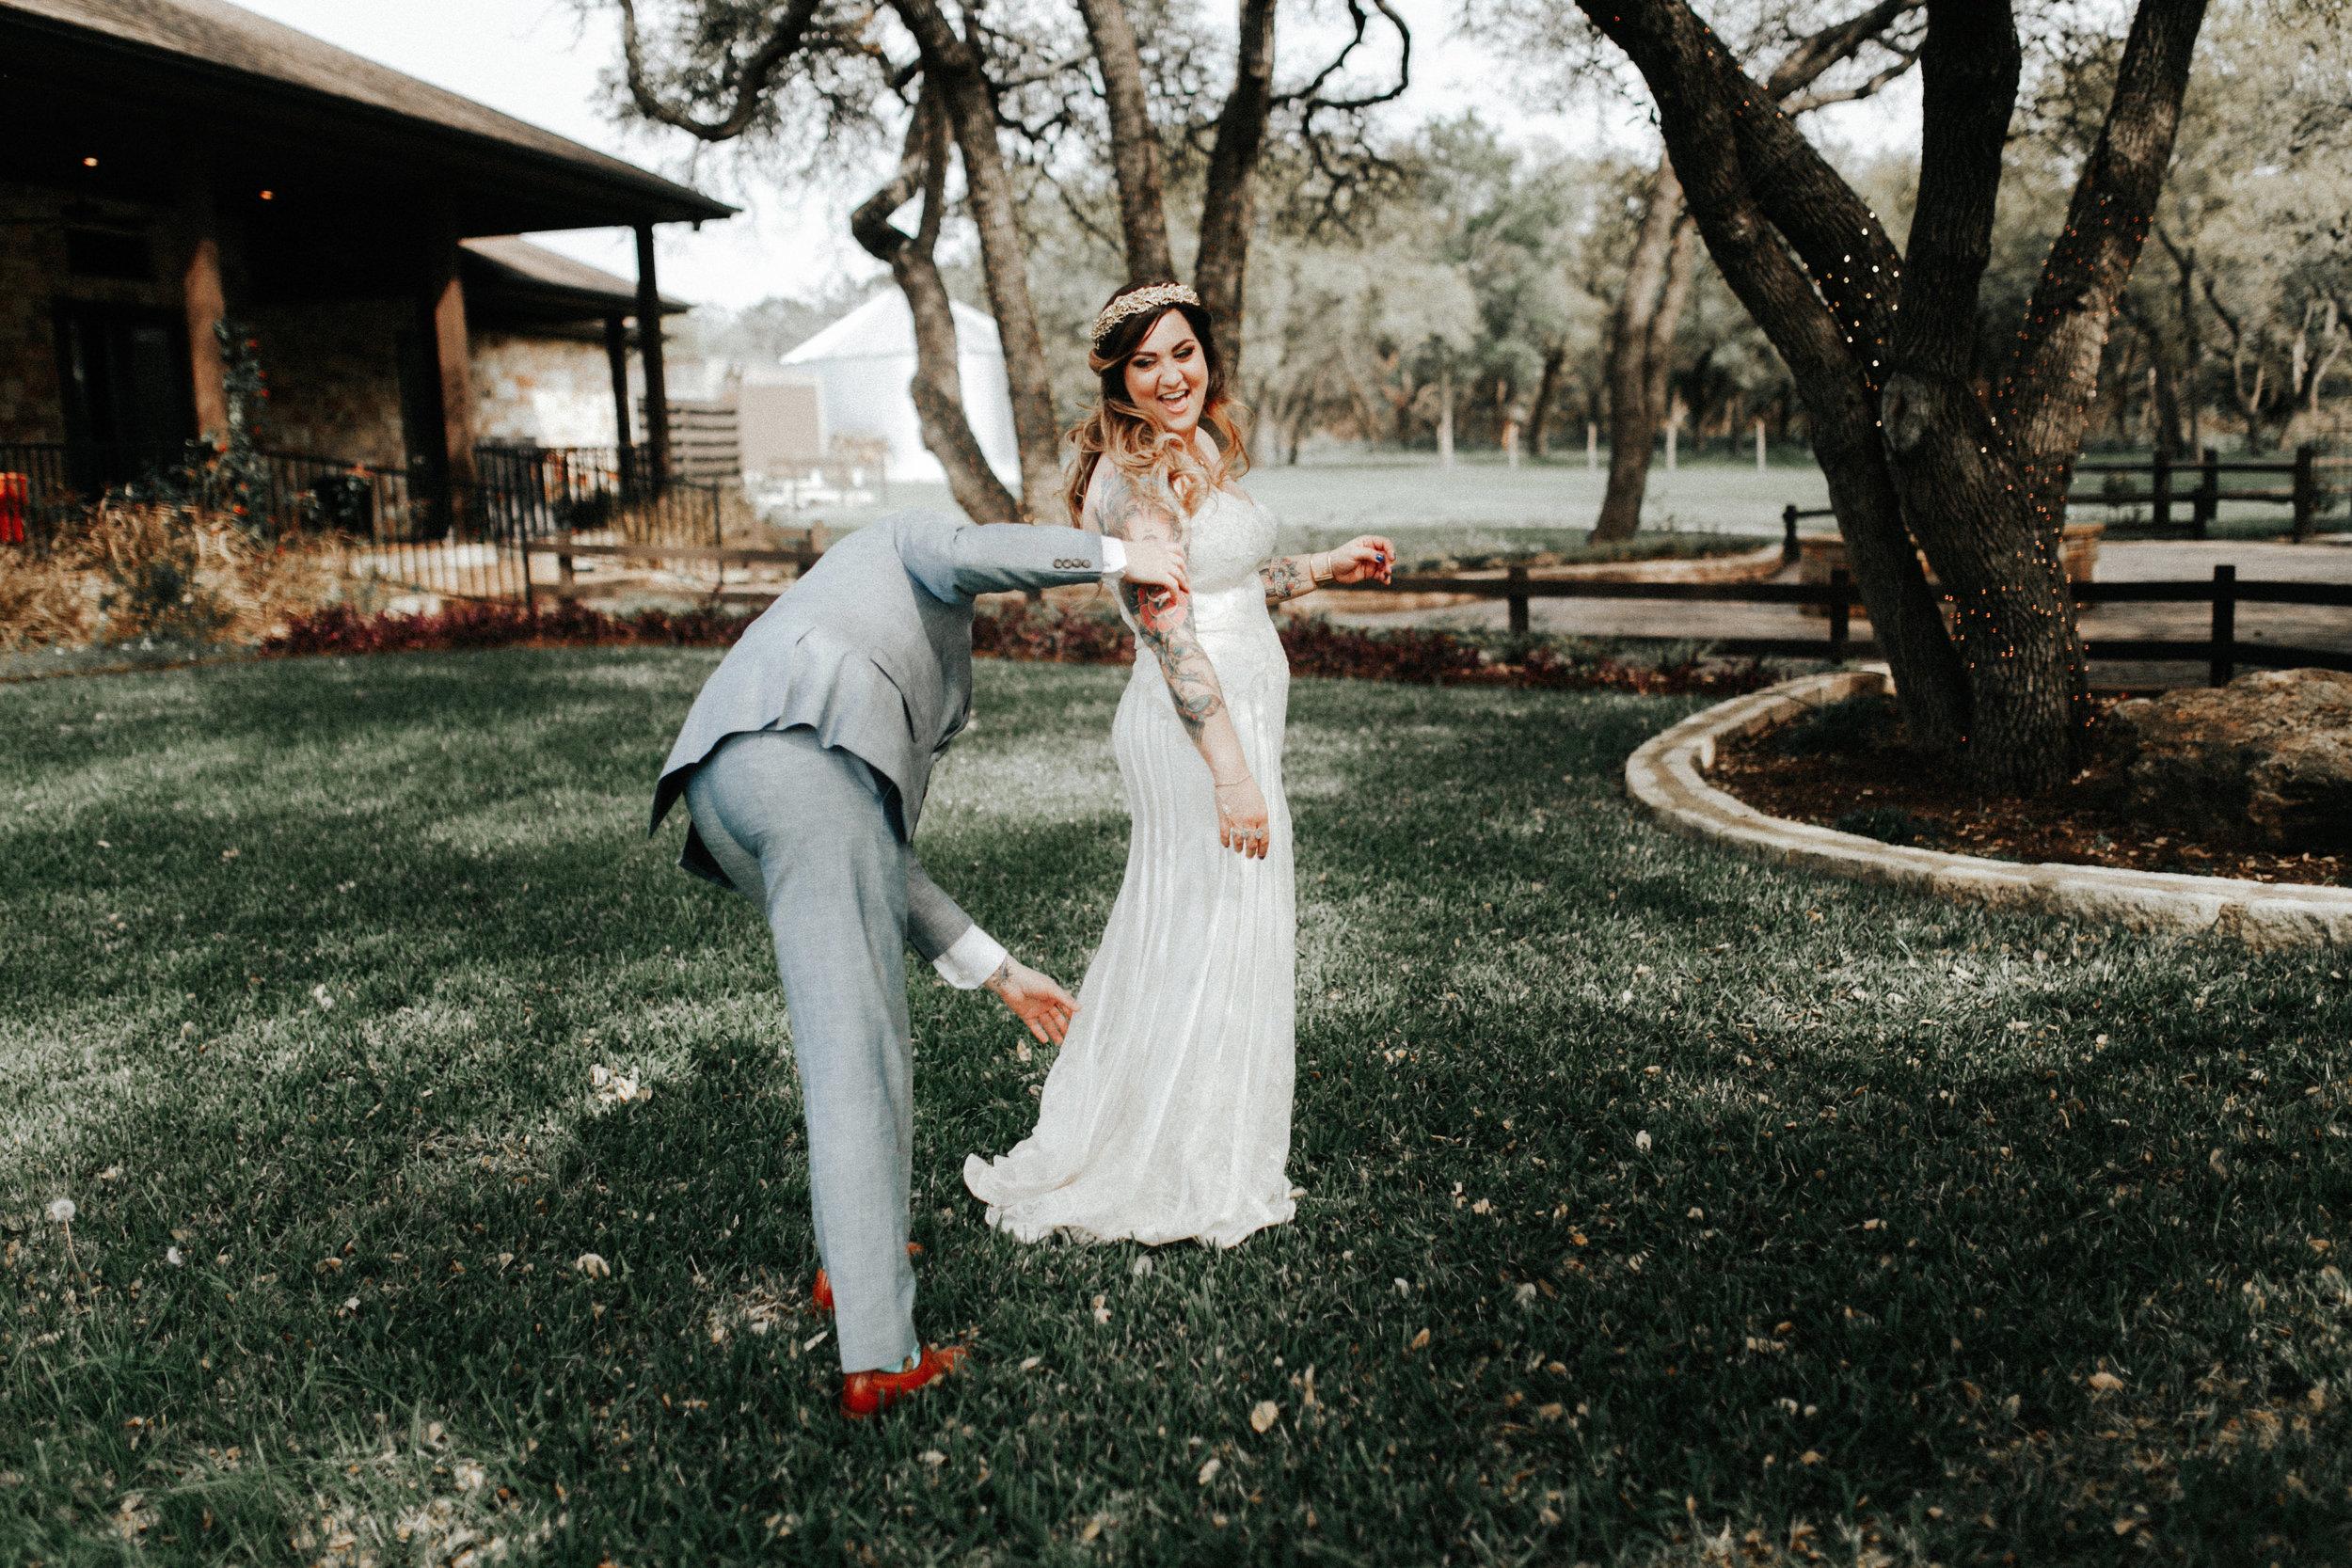 austin-wedding-photographer-19.jpg